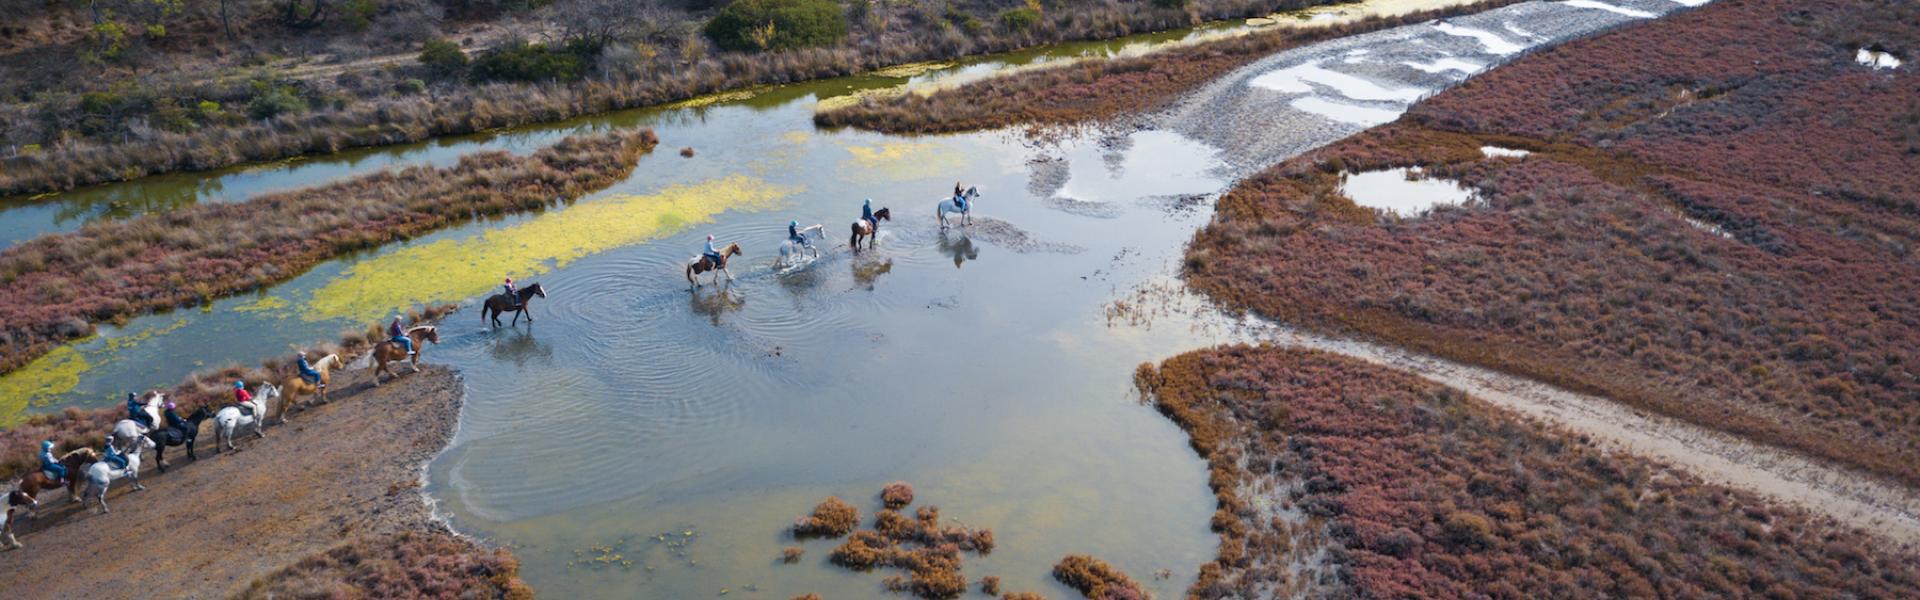 Balade a cheval ©Christelle LABRANDE